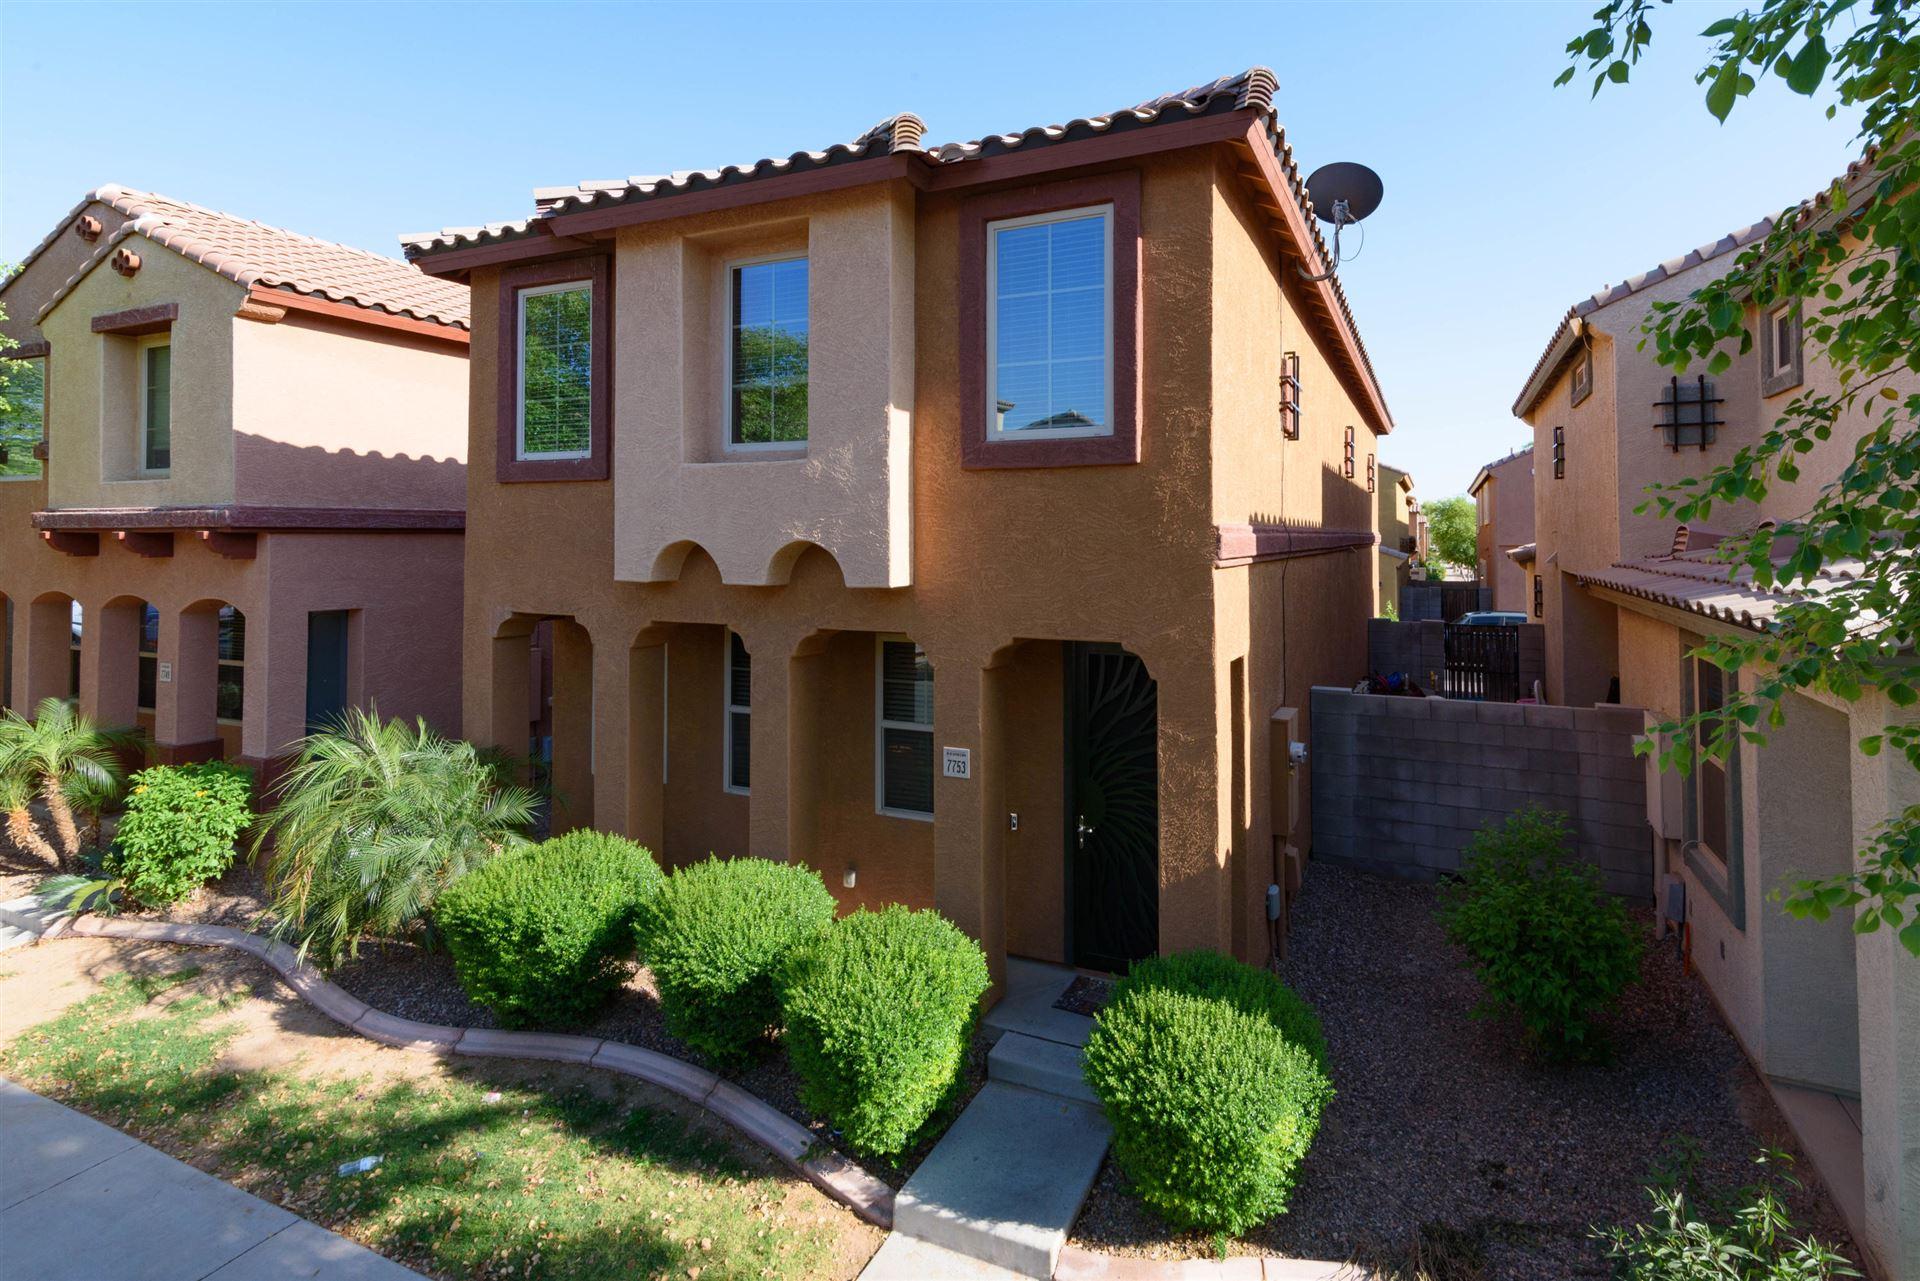 7753 W BONITOS Drive, Phoenix, AZ 85035 - MLS#: 6231256